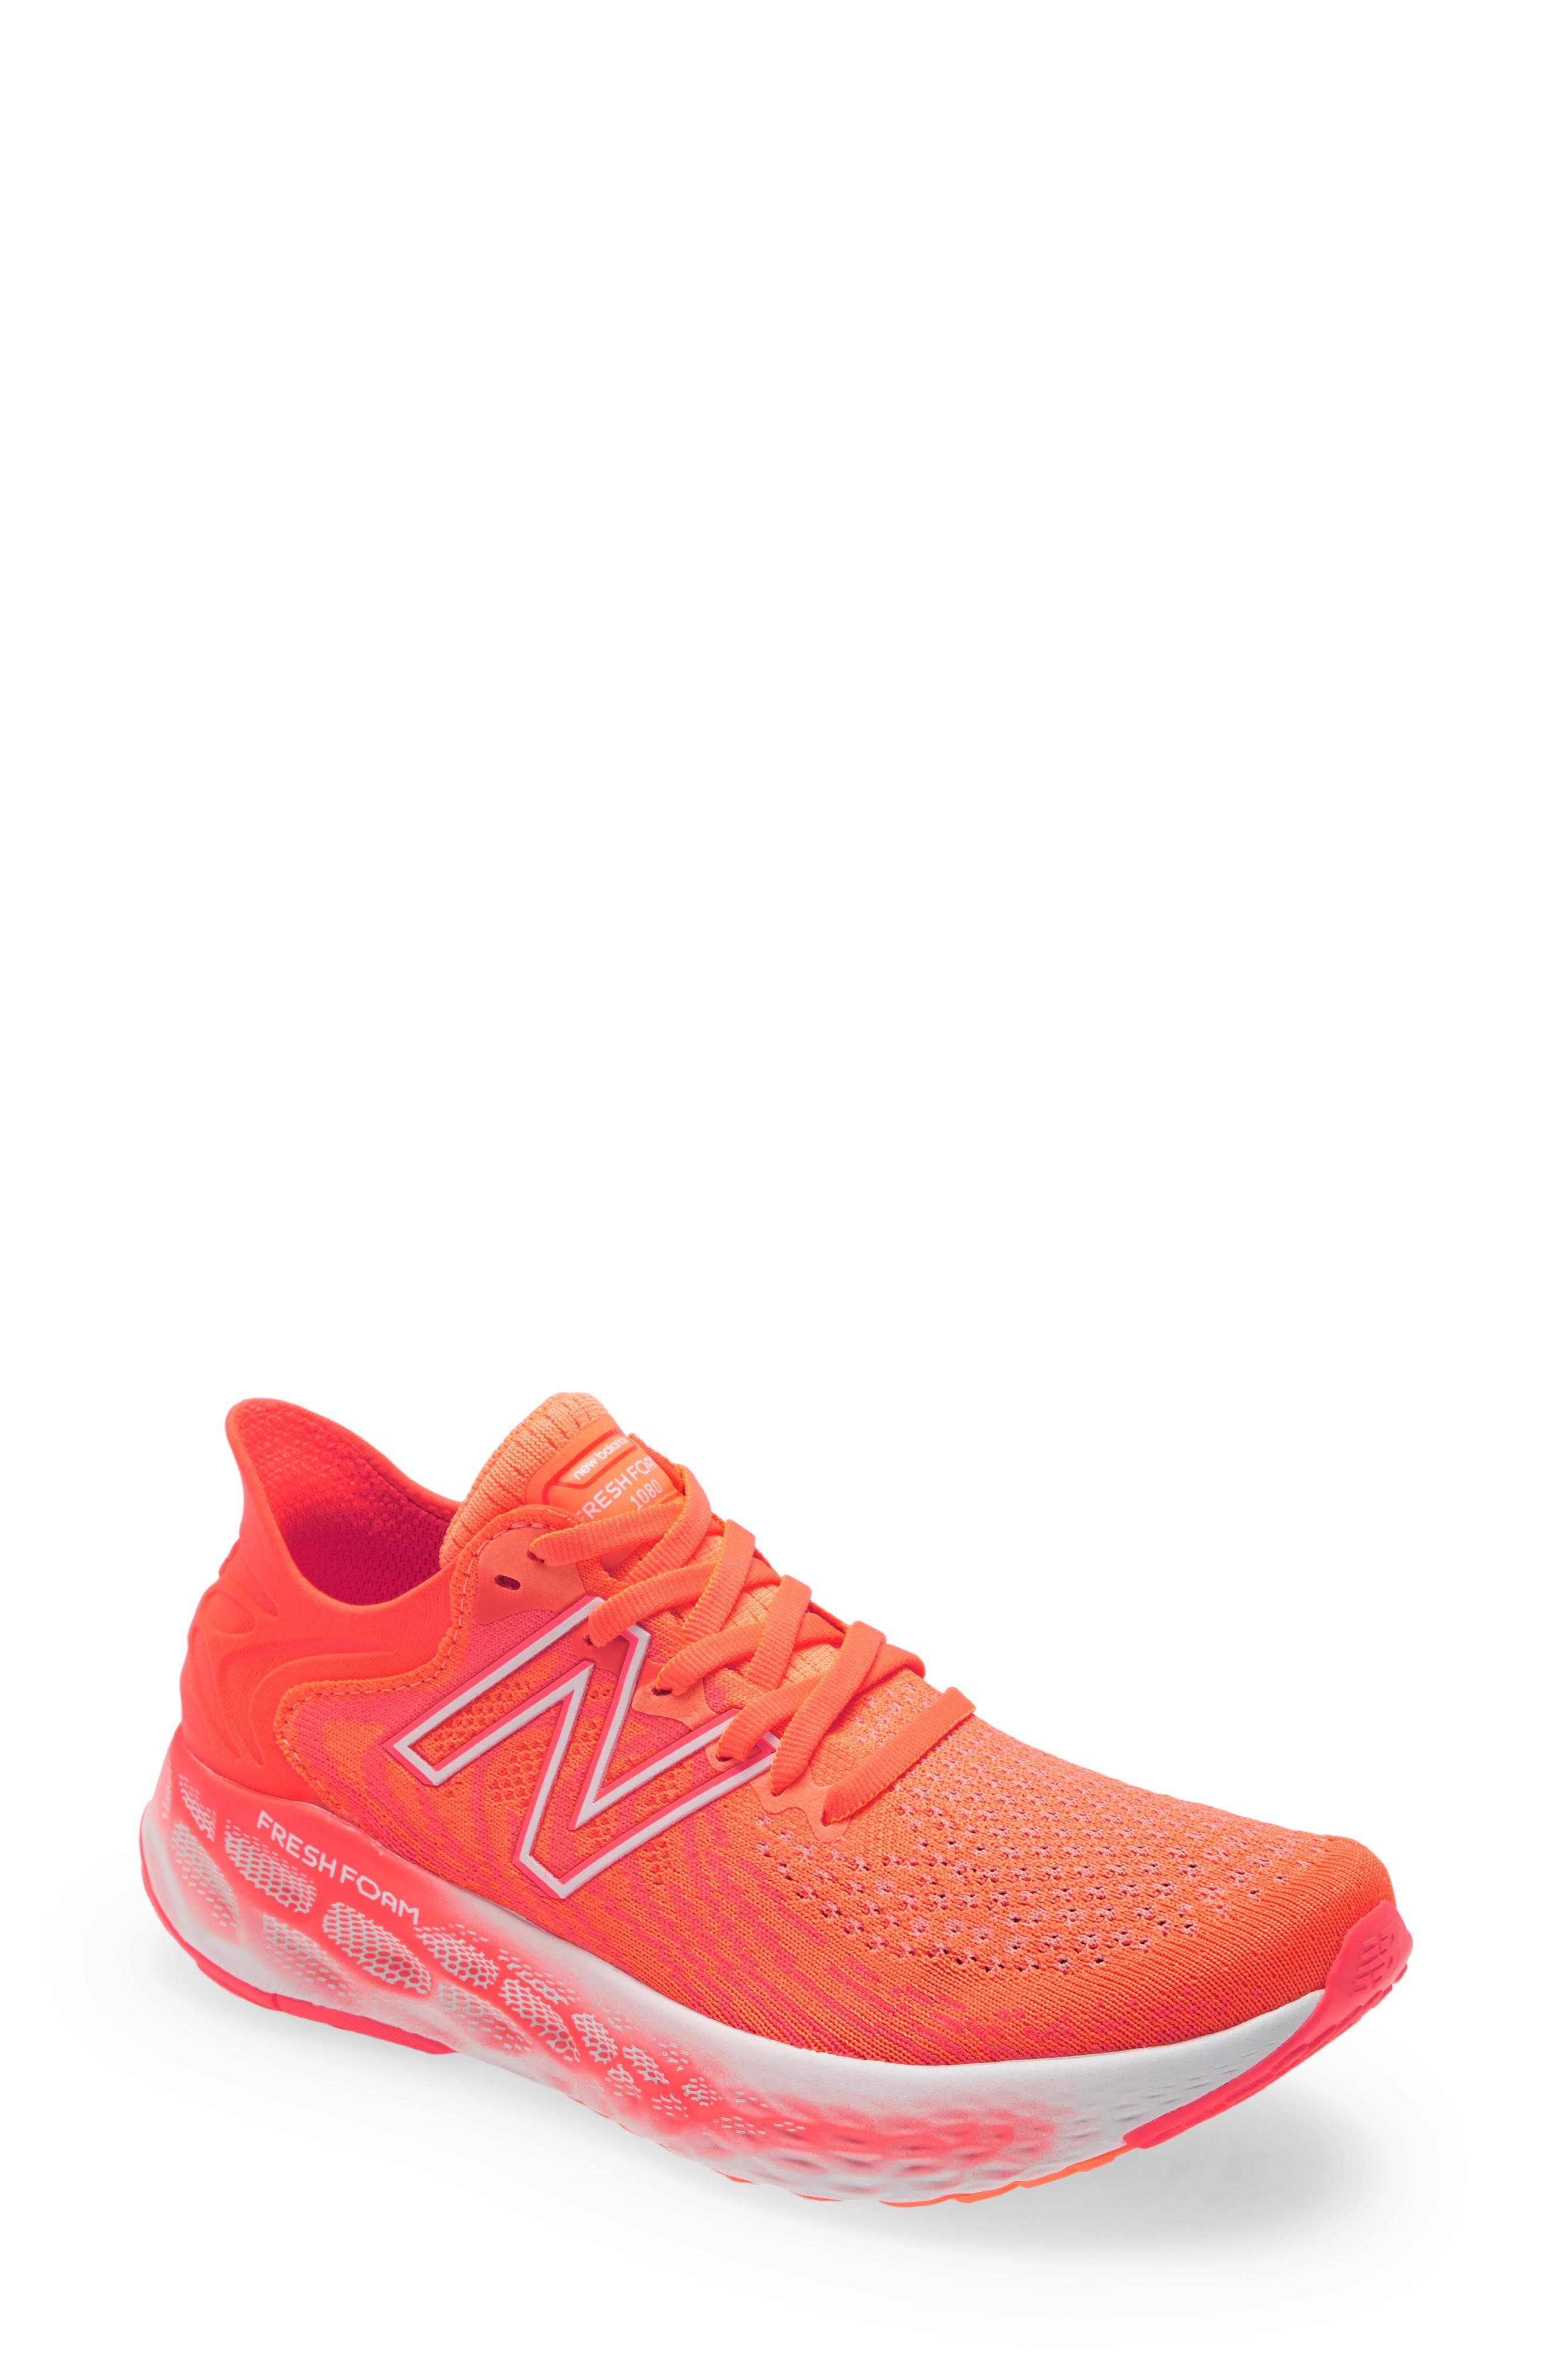 womens new balance shoes